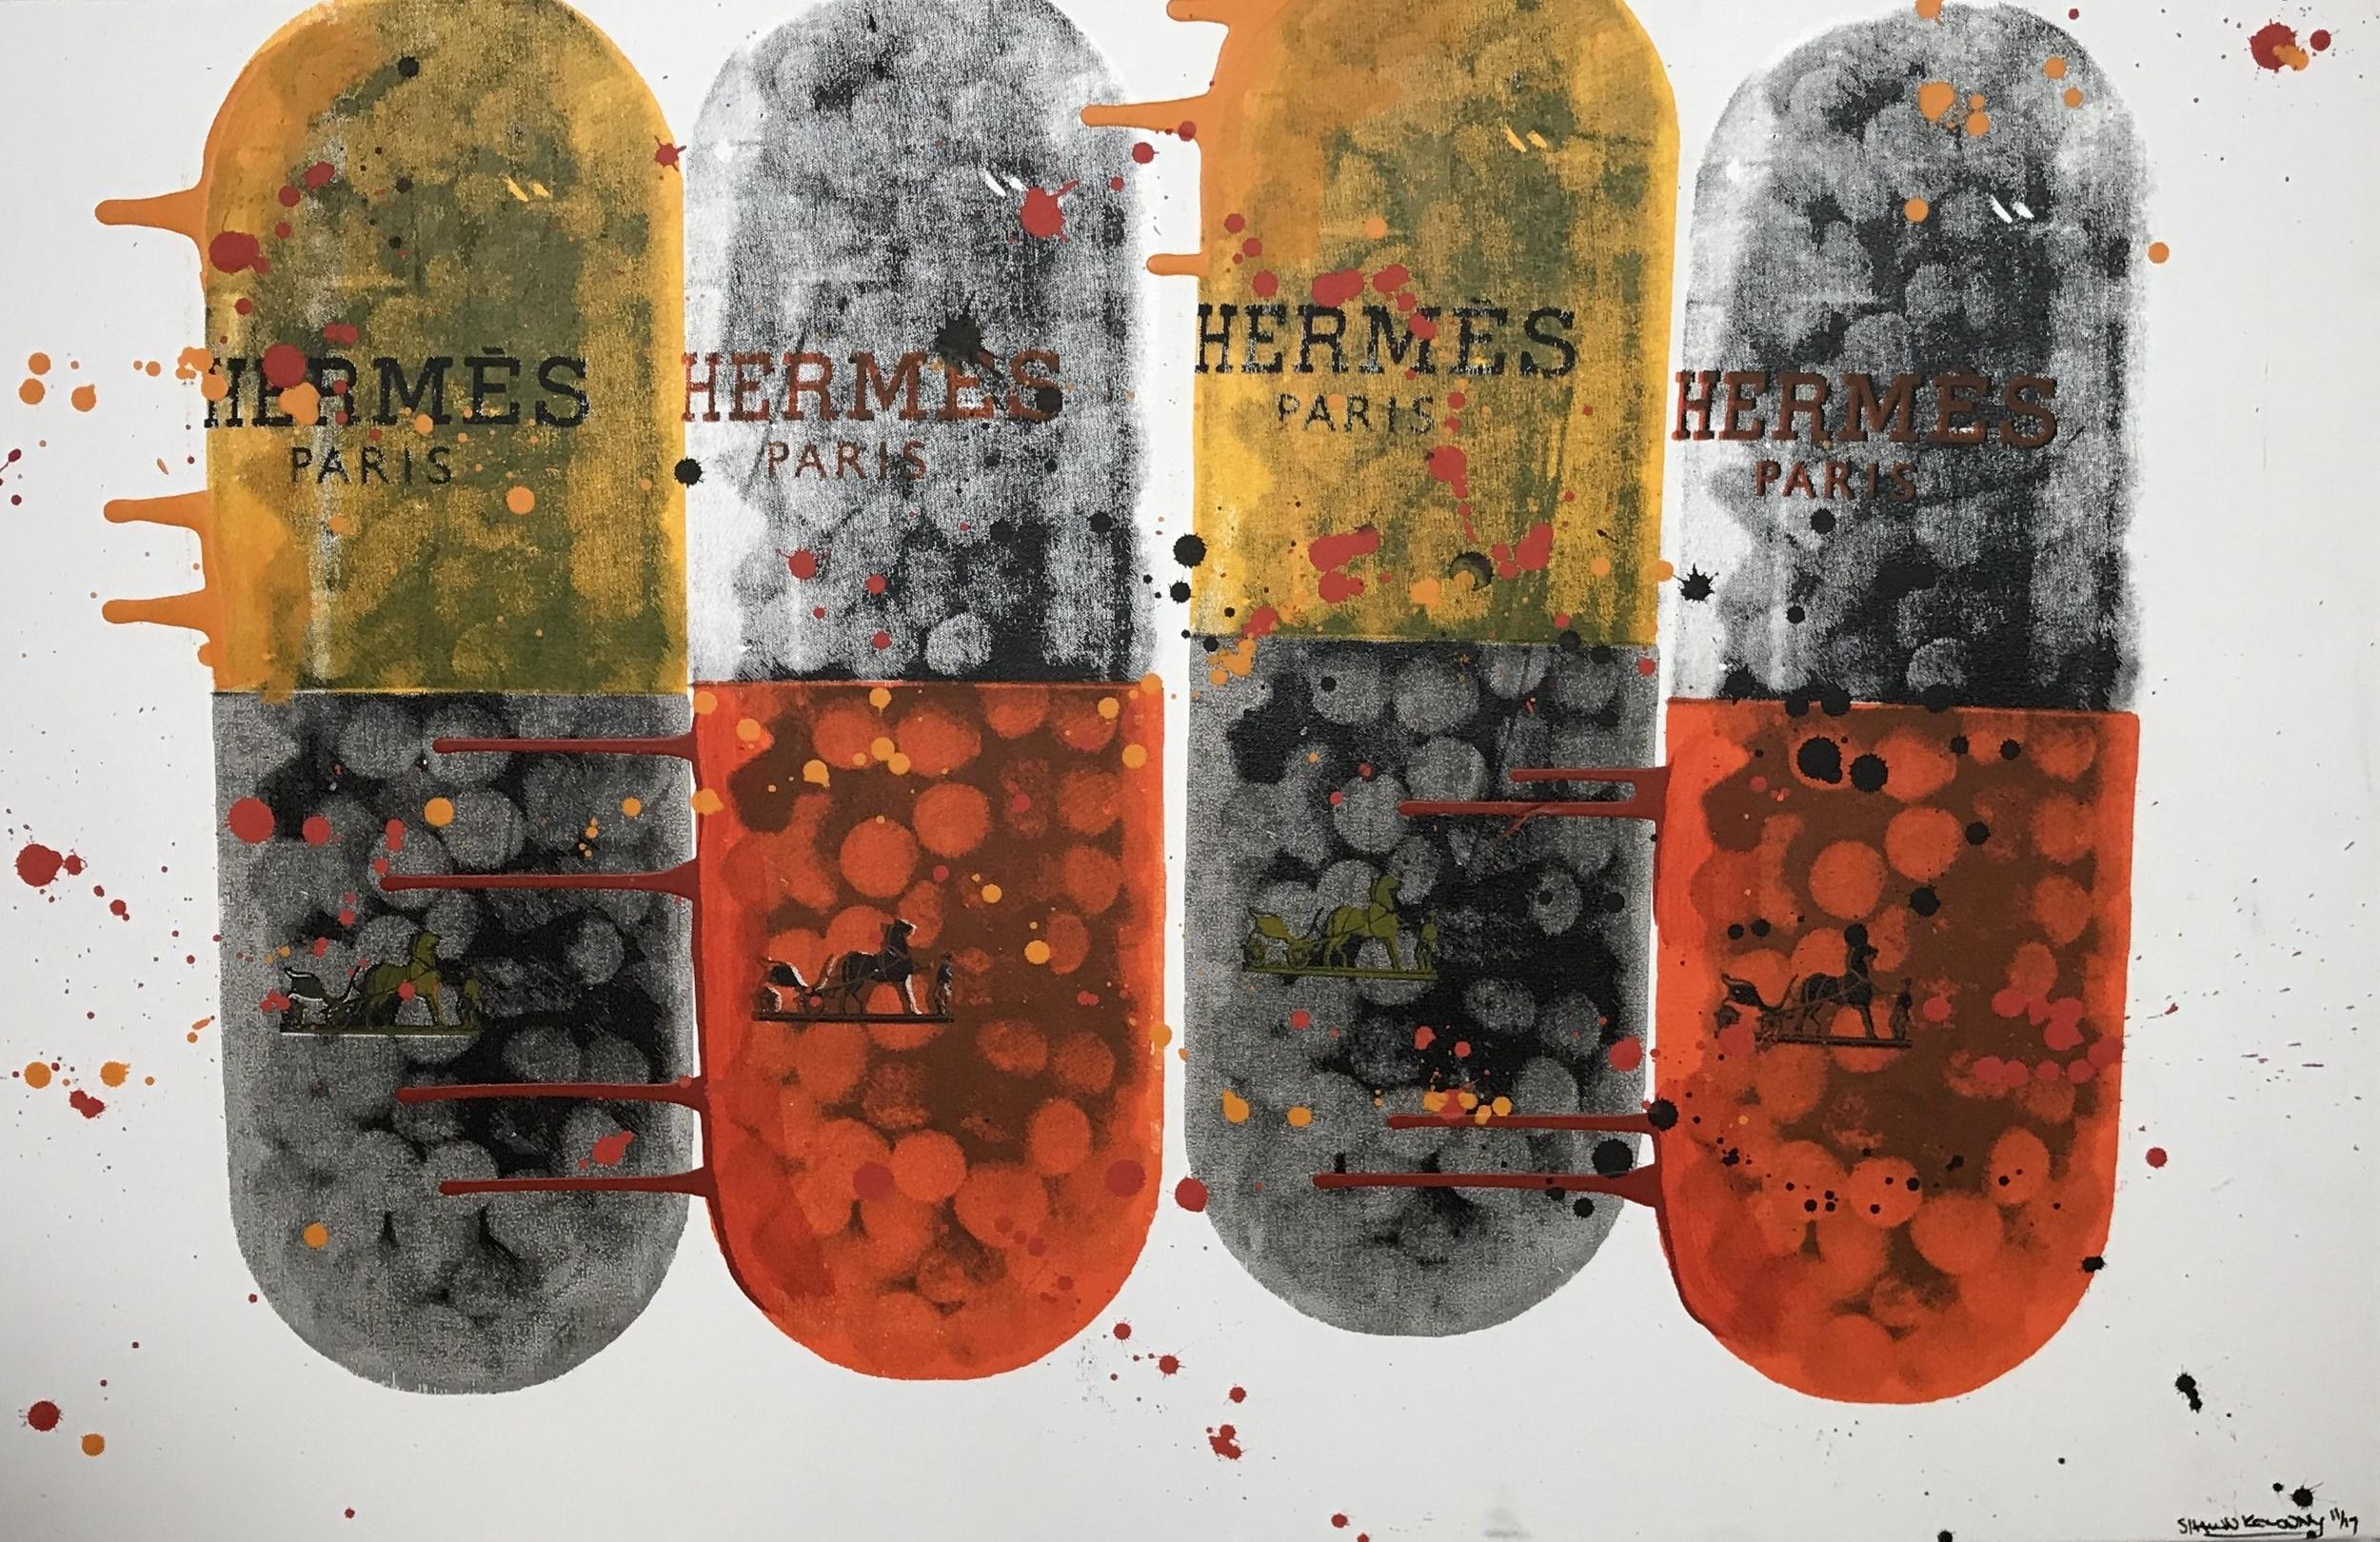 sideways 1/1 - 40 x 26, Acrylic on Canvas, Oct '17IMITATE MODERN